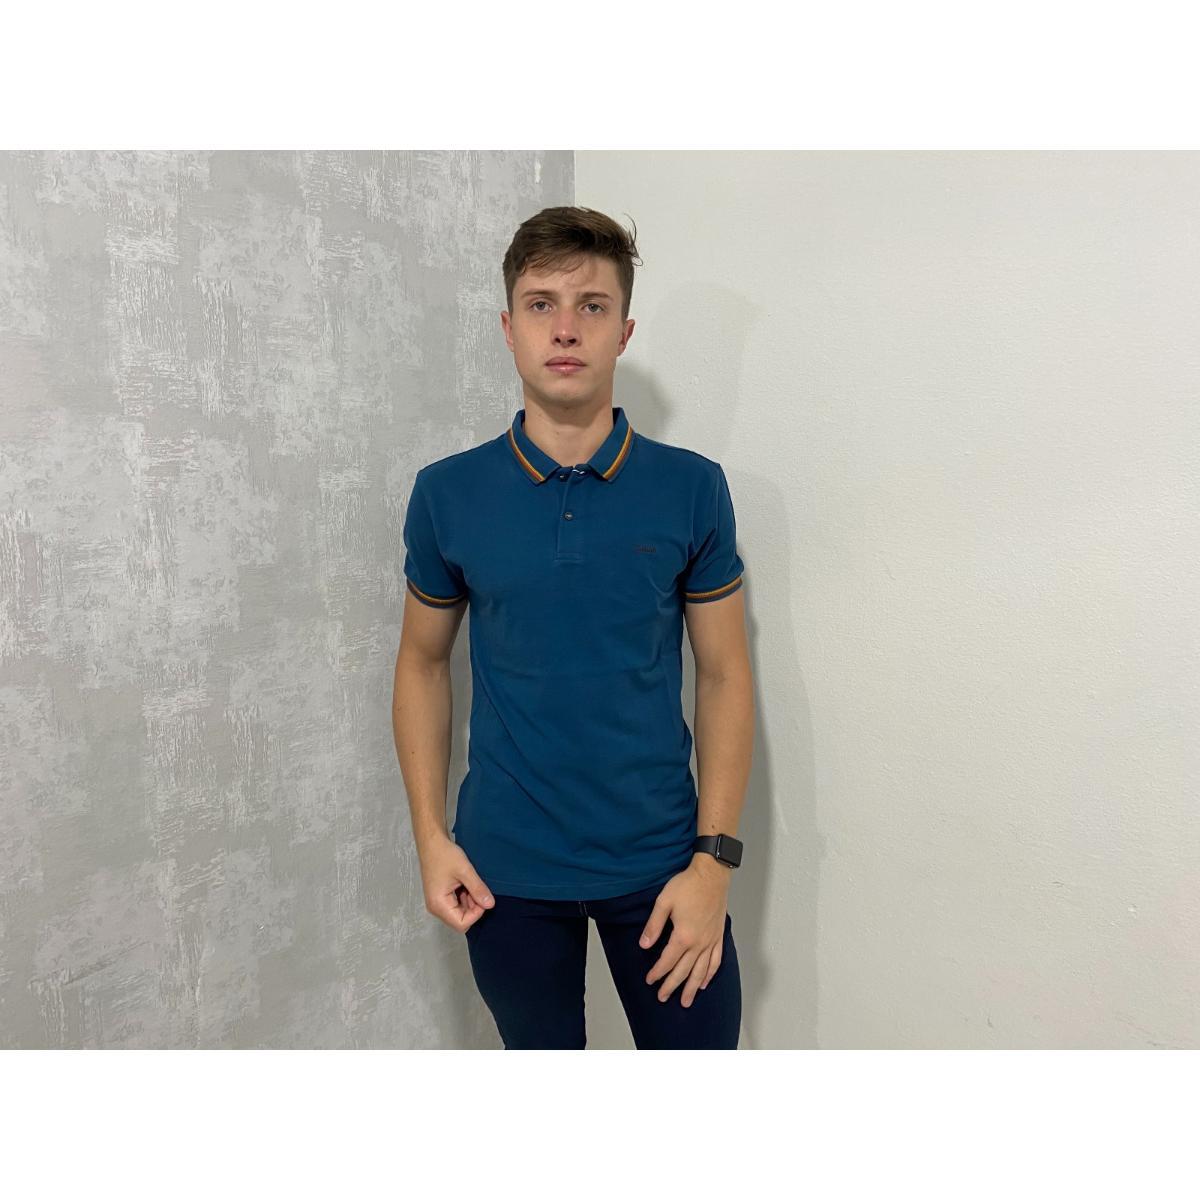 Camiseta Masculina Colcci 250102451 63233 Azul